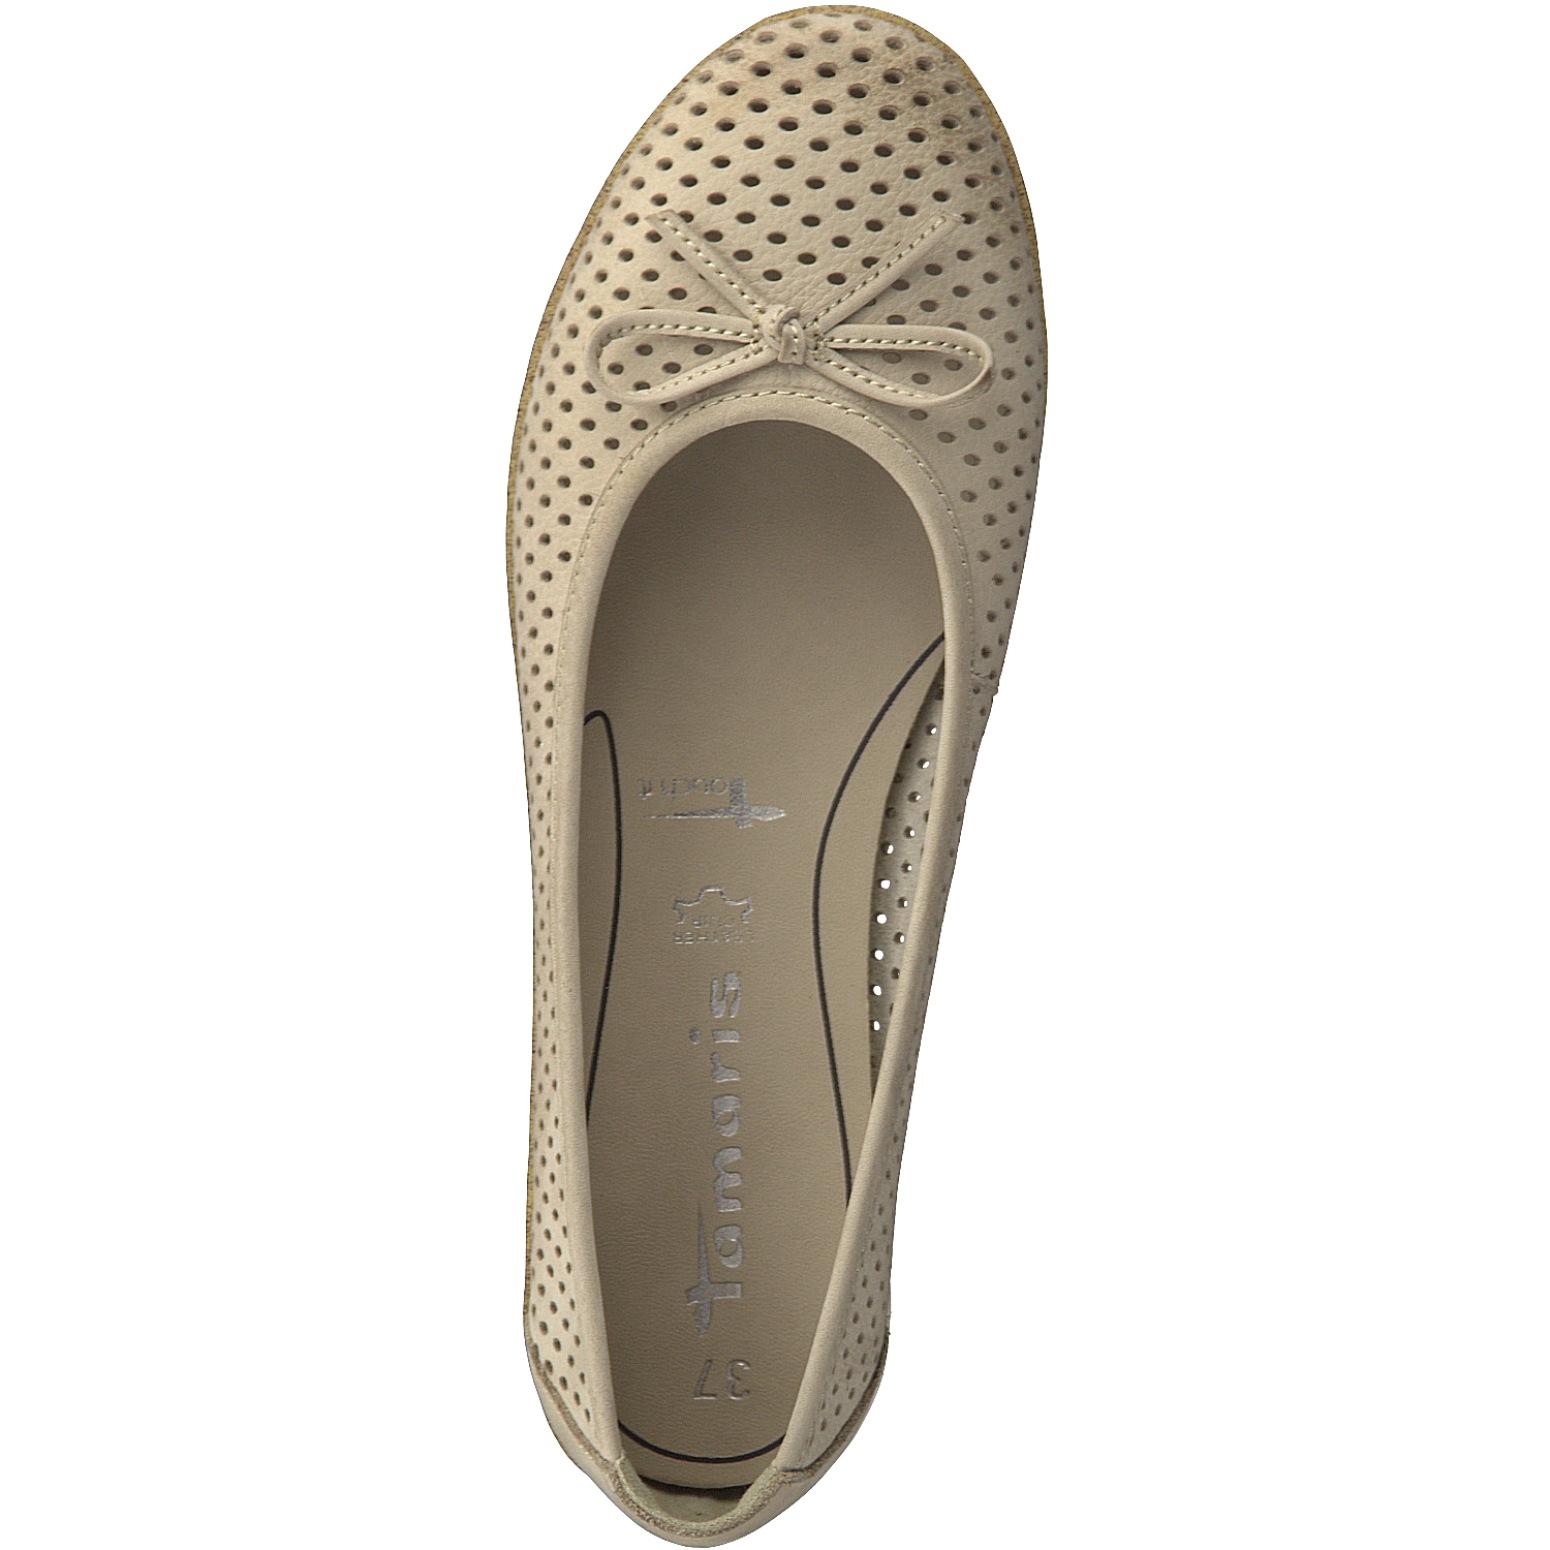 detailed look 79edc 40cbc Tamaris Damen Ballerina 1-22121-20-375 antelope beige